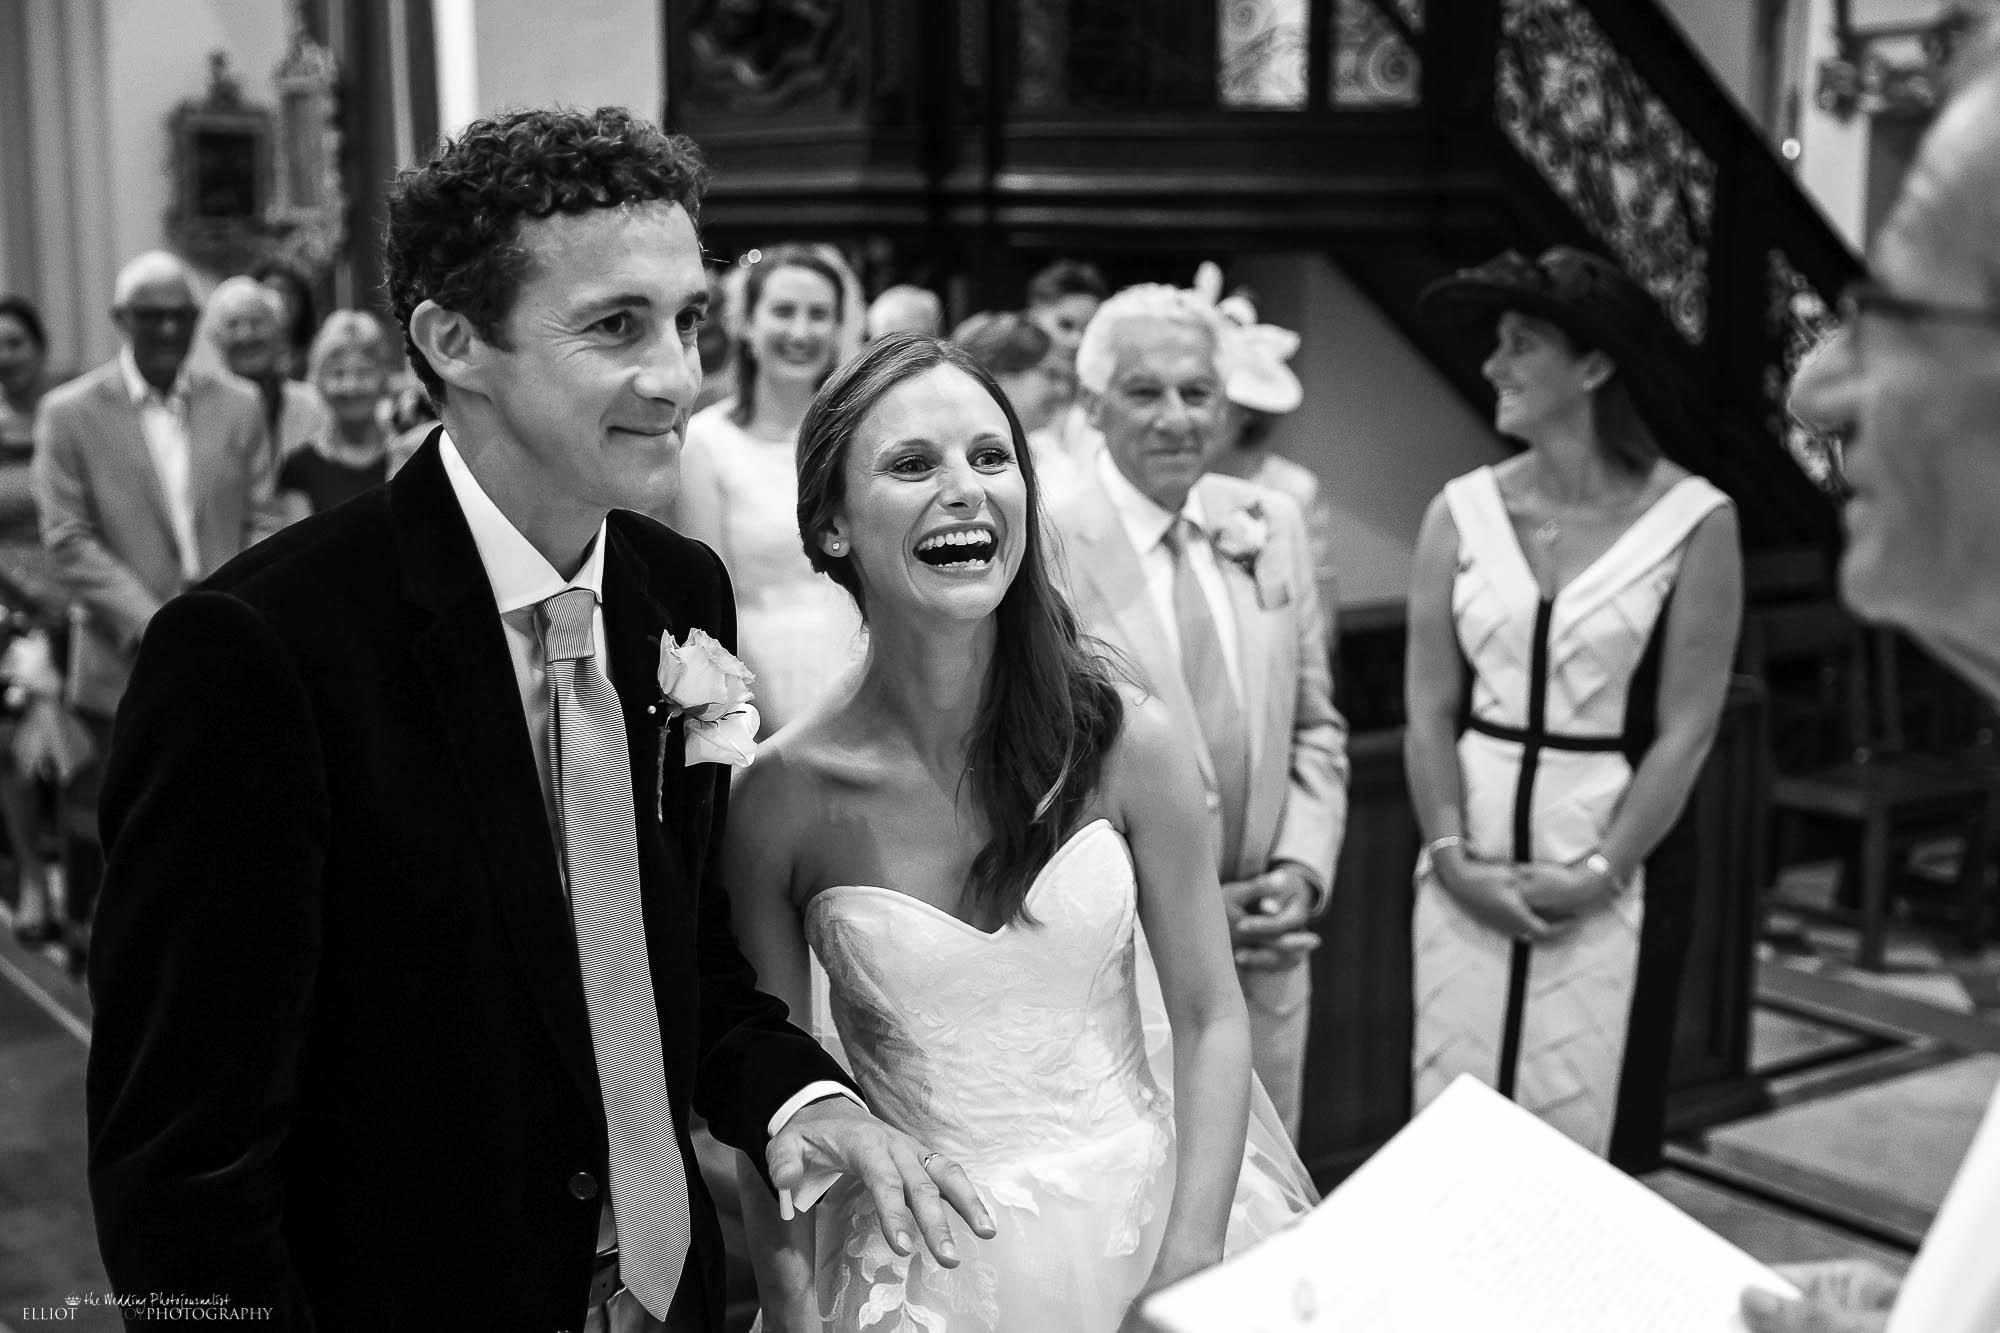 wedding-bride-groom-laughing-church-photography